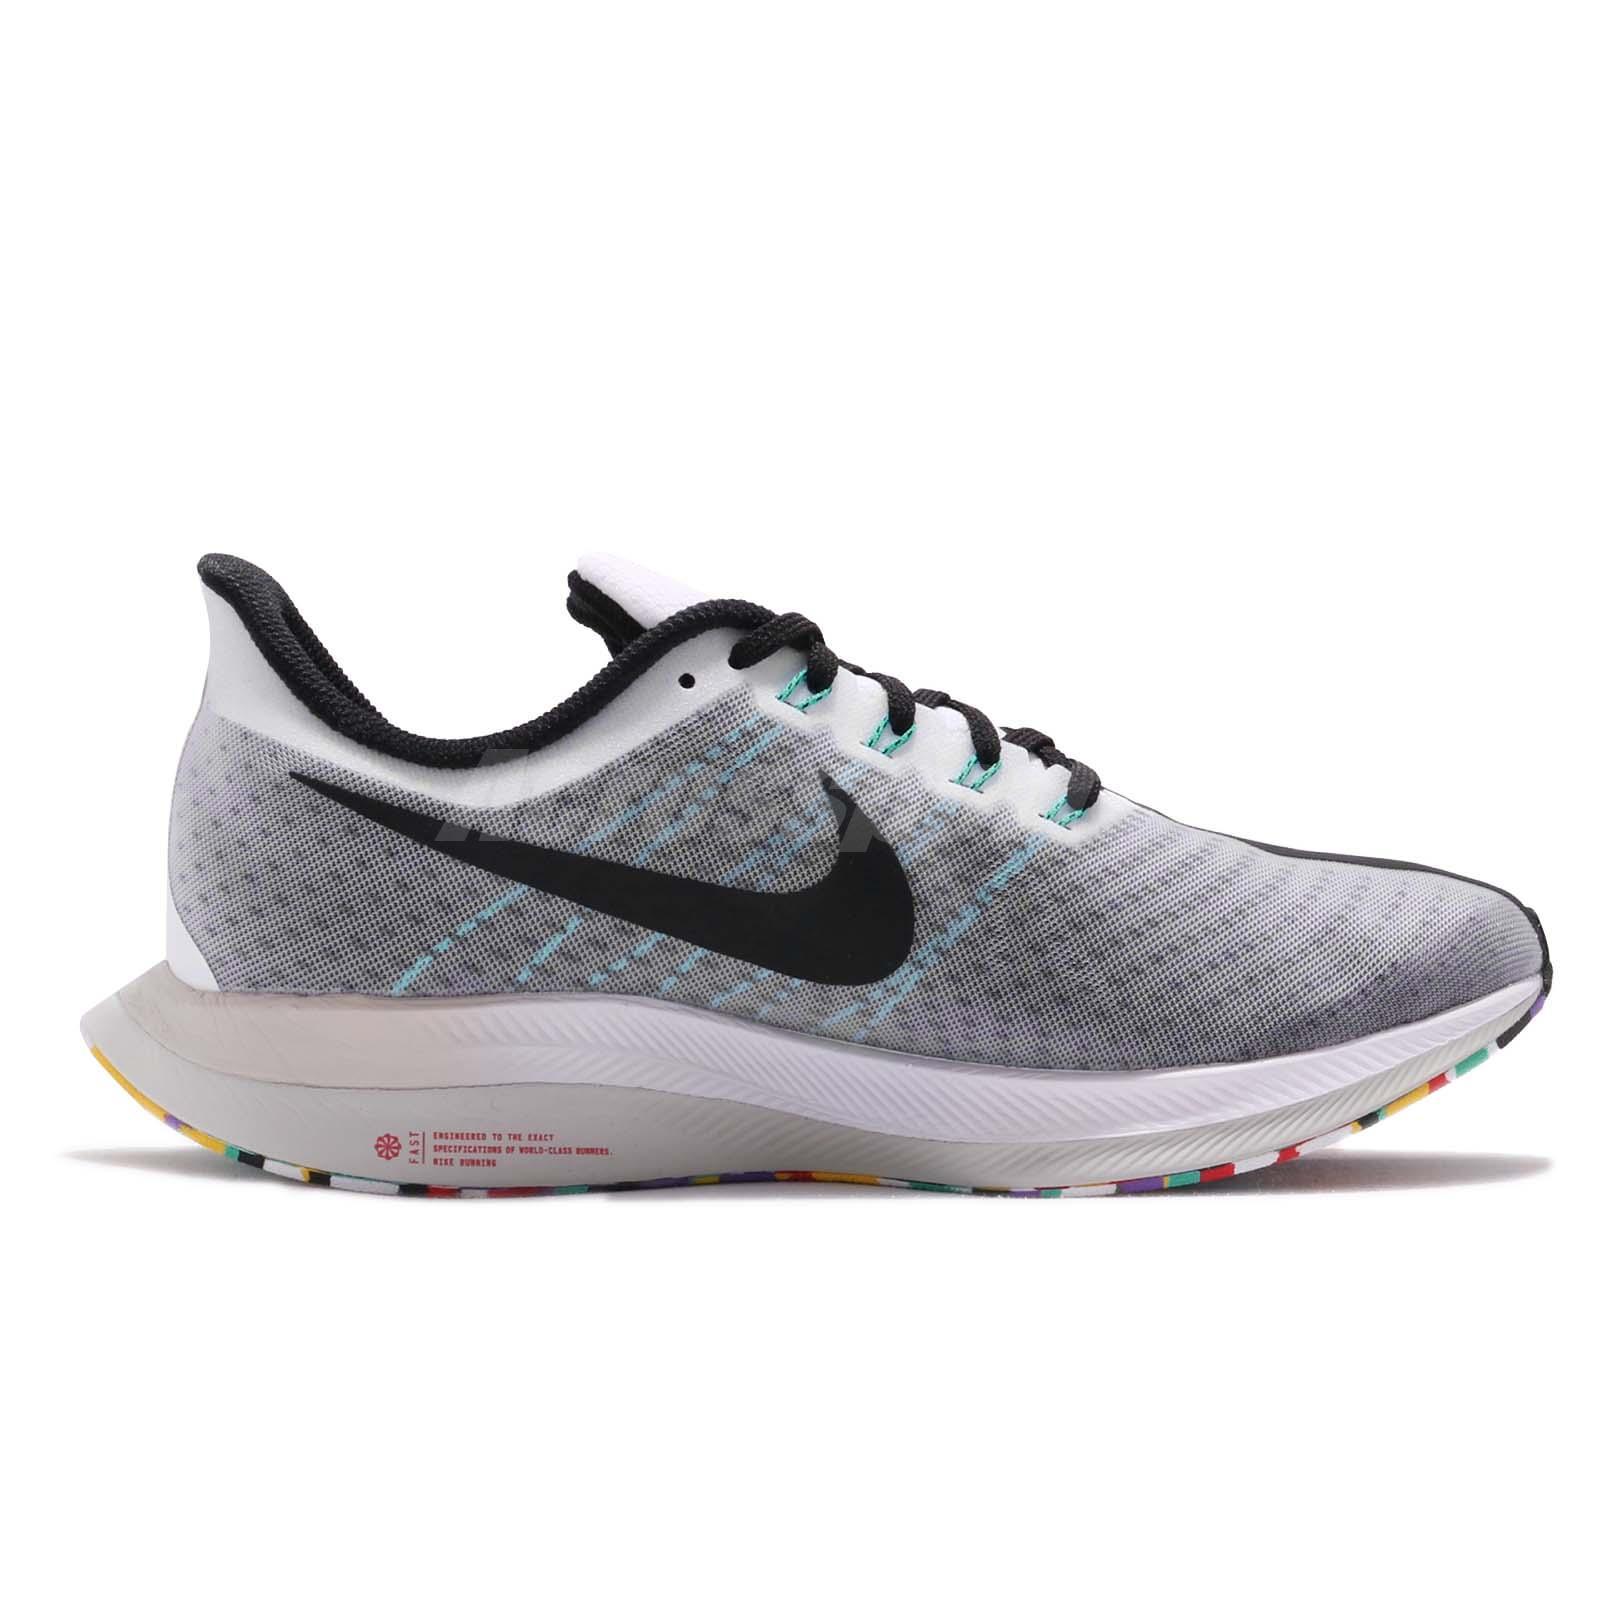 competitive price b3099 8ec71 Details about Nike Zoom Pegasus 35 Turbo White Black Hyper Jade Men Running  Shoes AJ4114-101